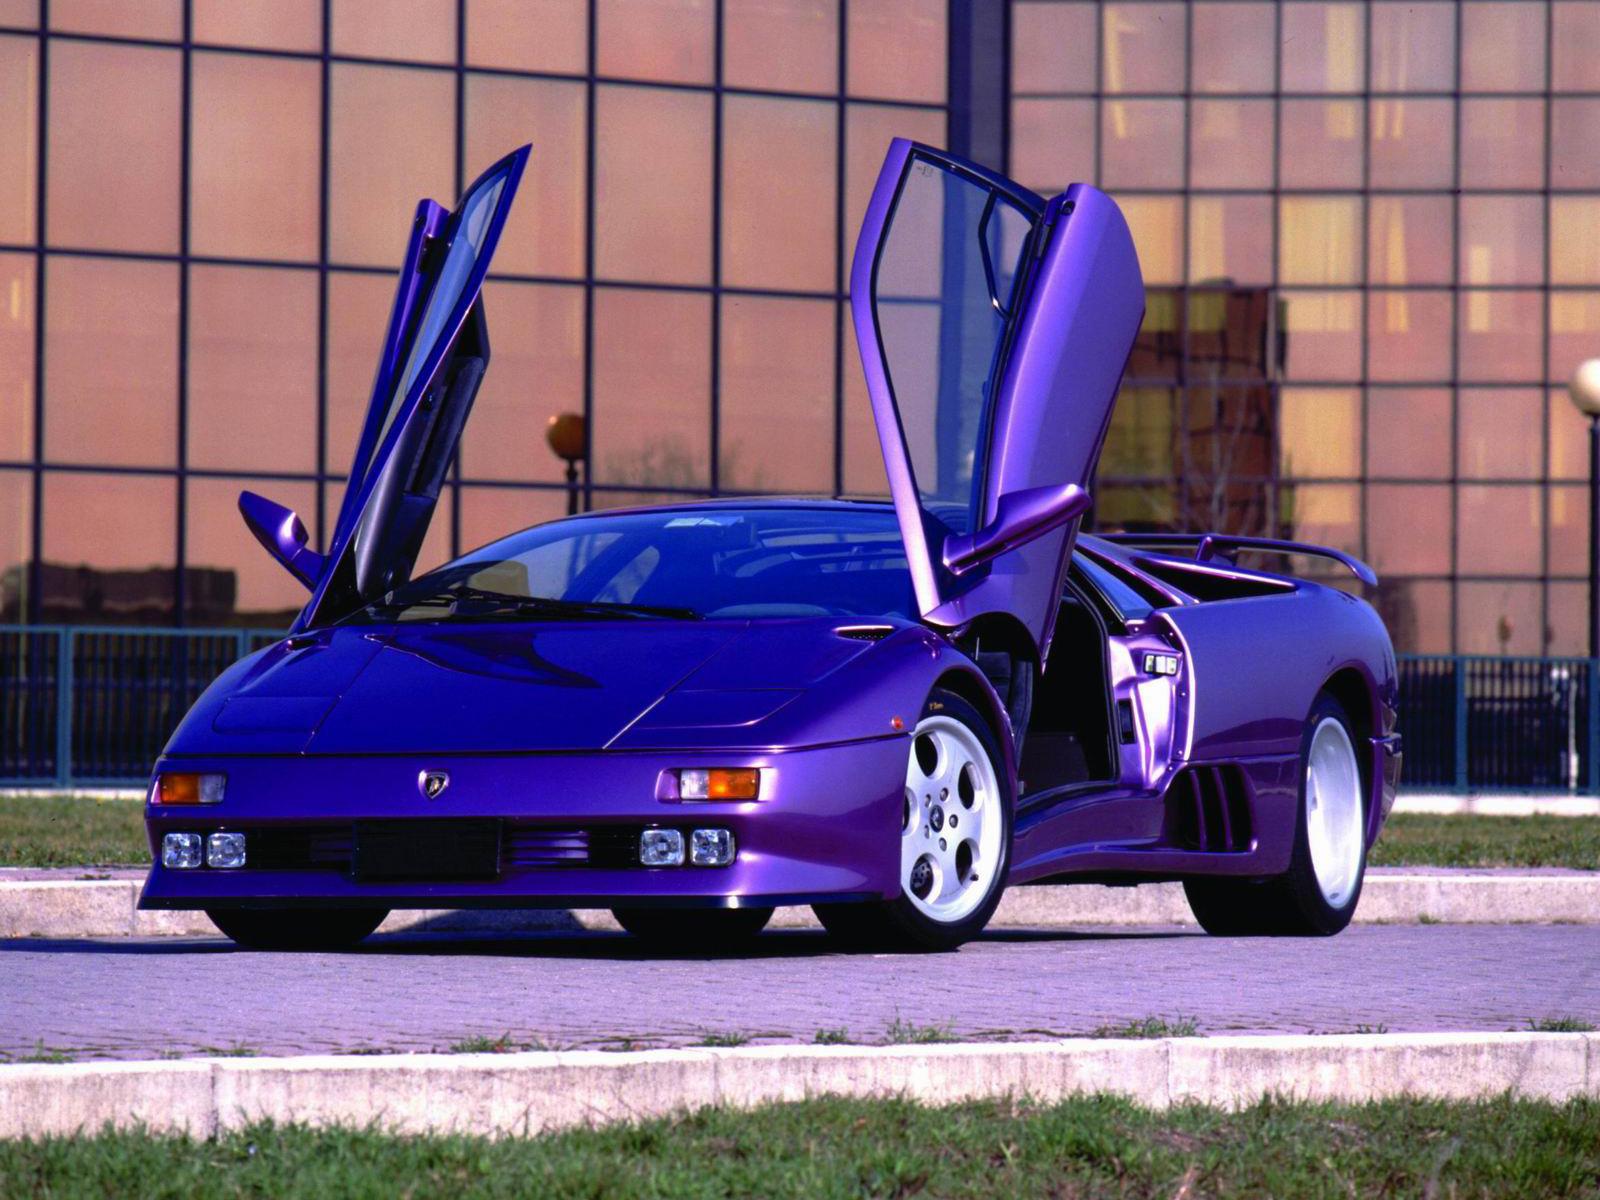 Lamborghini Diablo Se30 Picture 61153 Lamborghini Photo